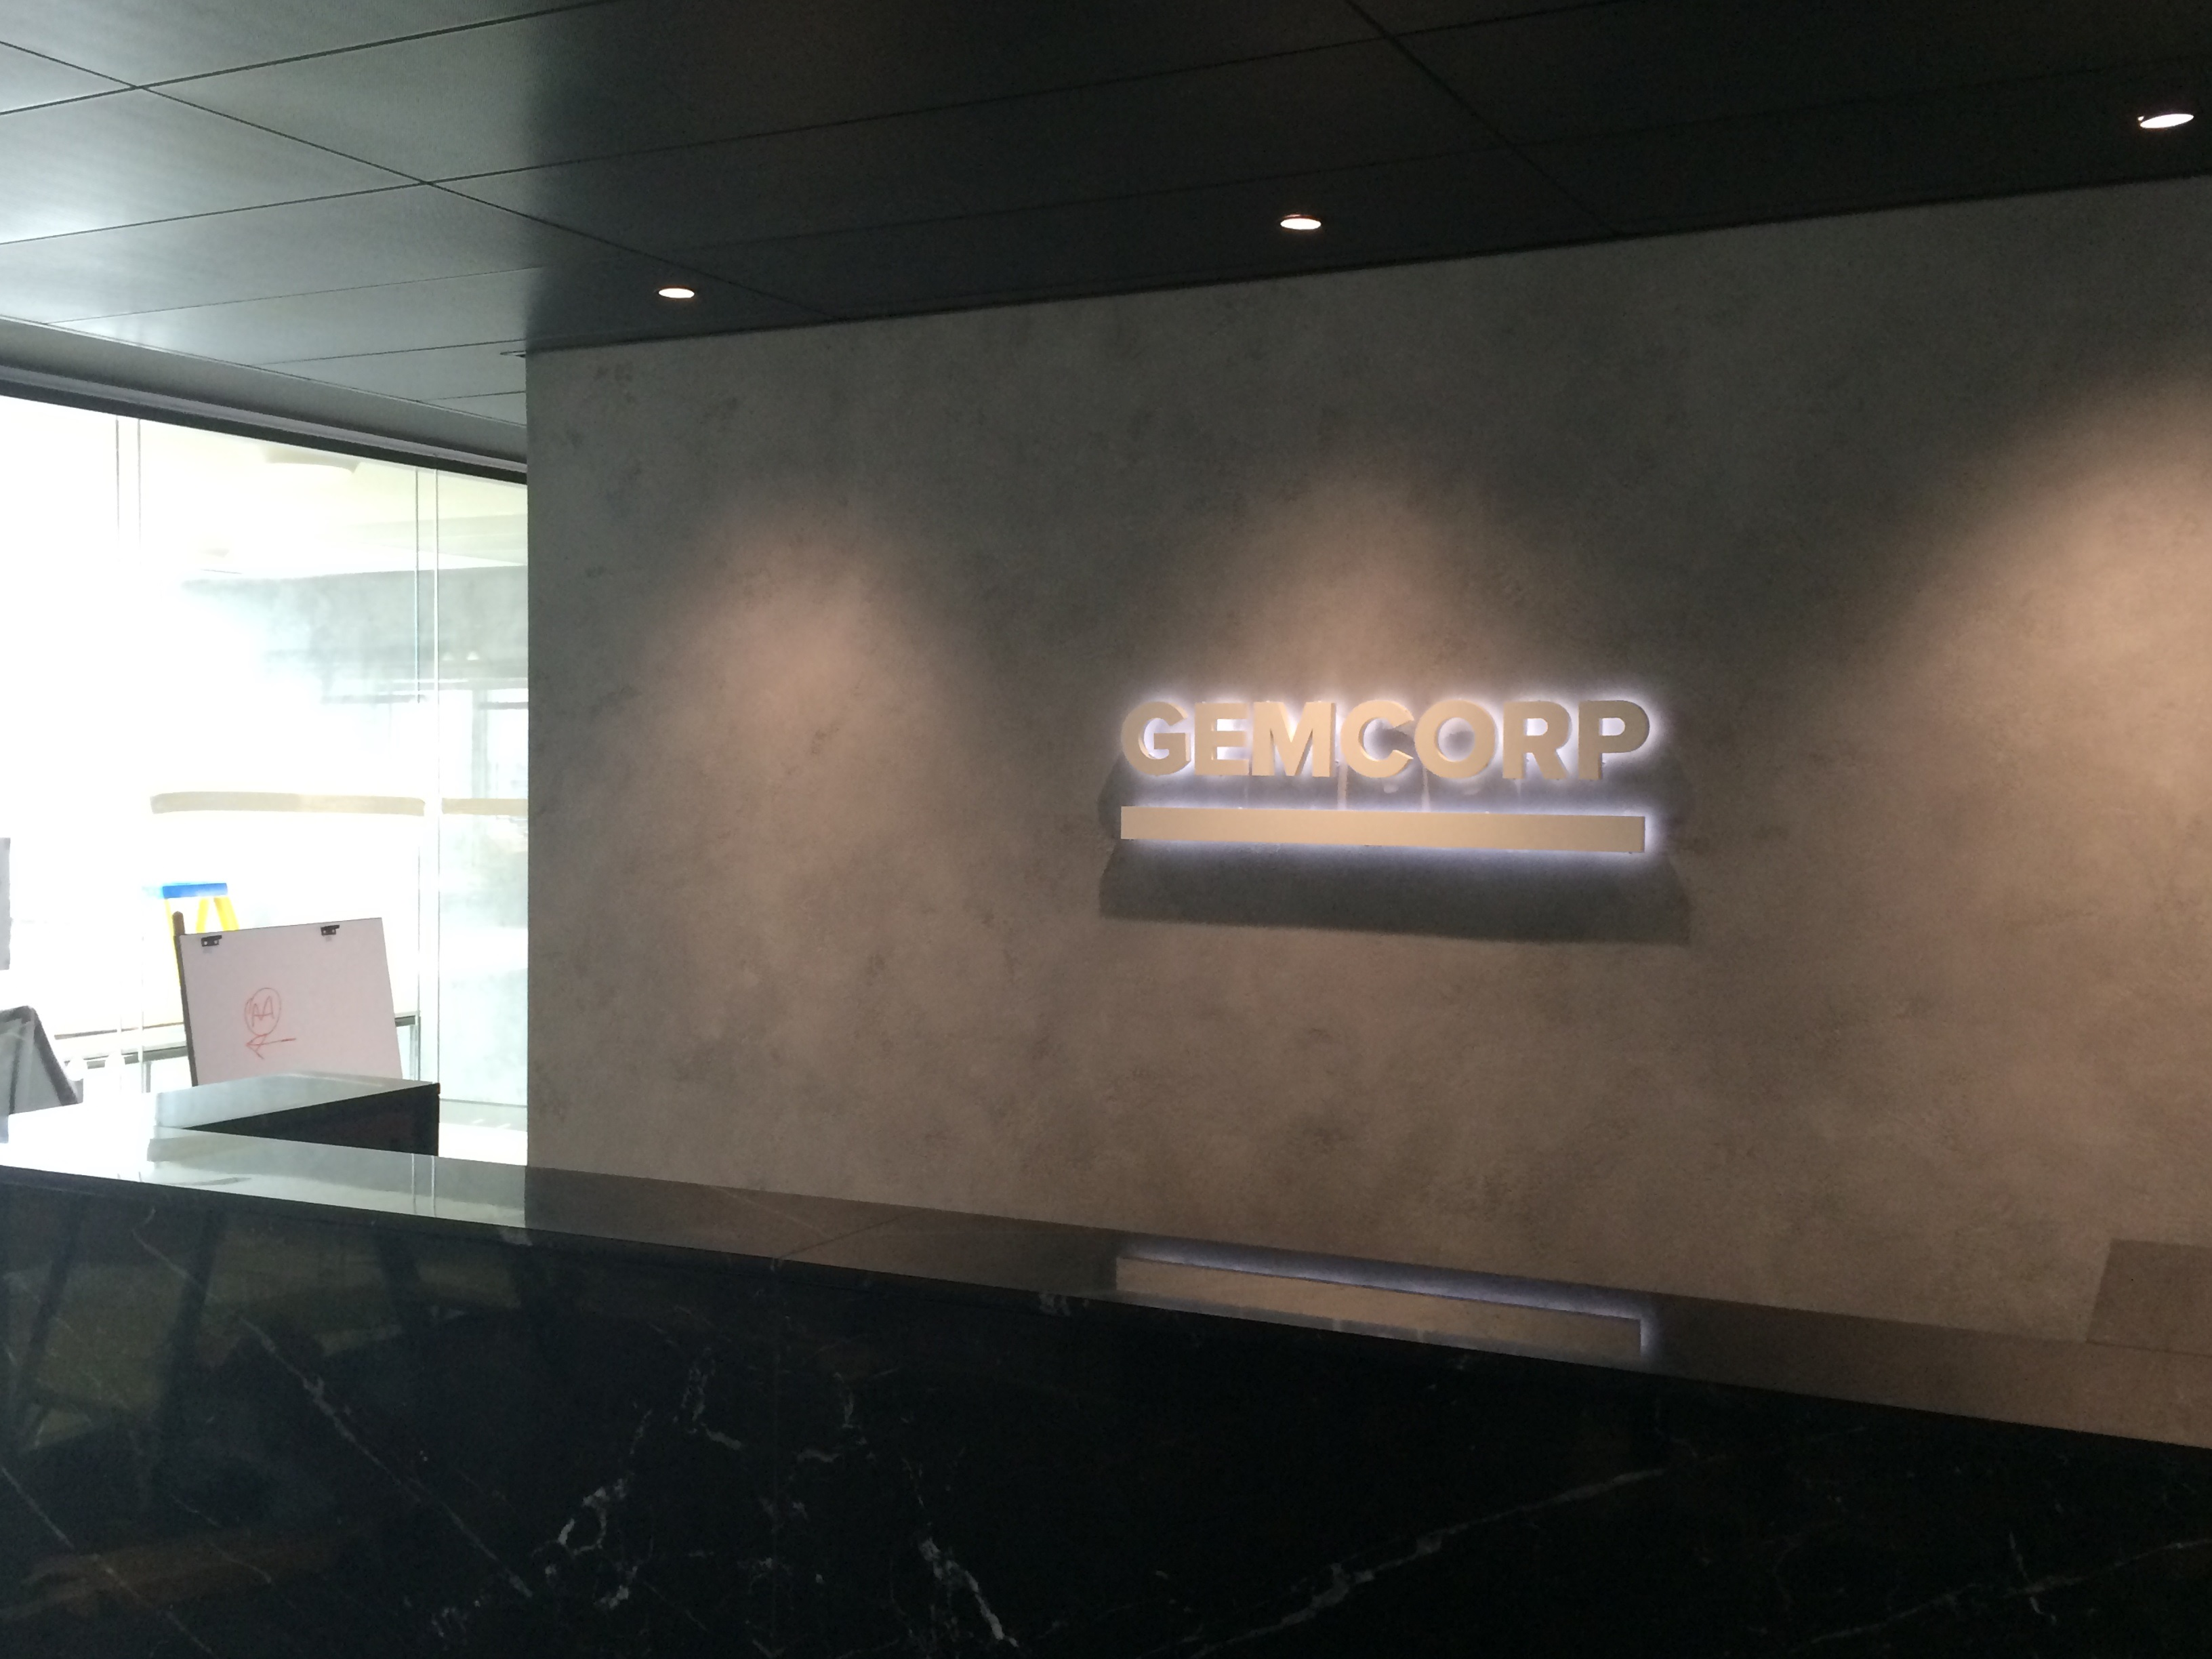 Gemcorp